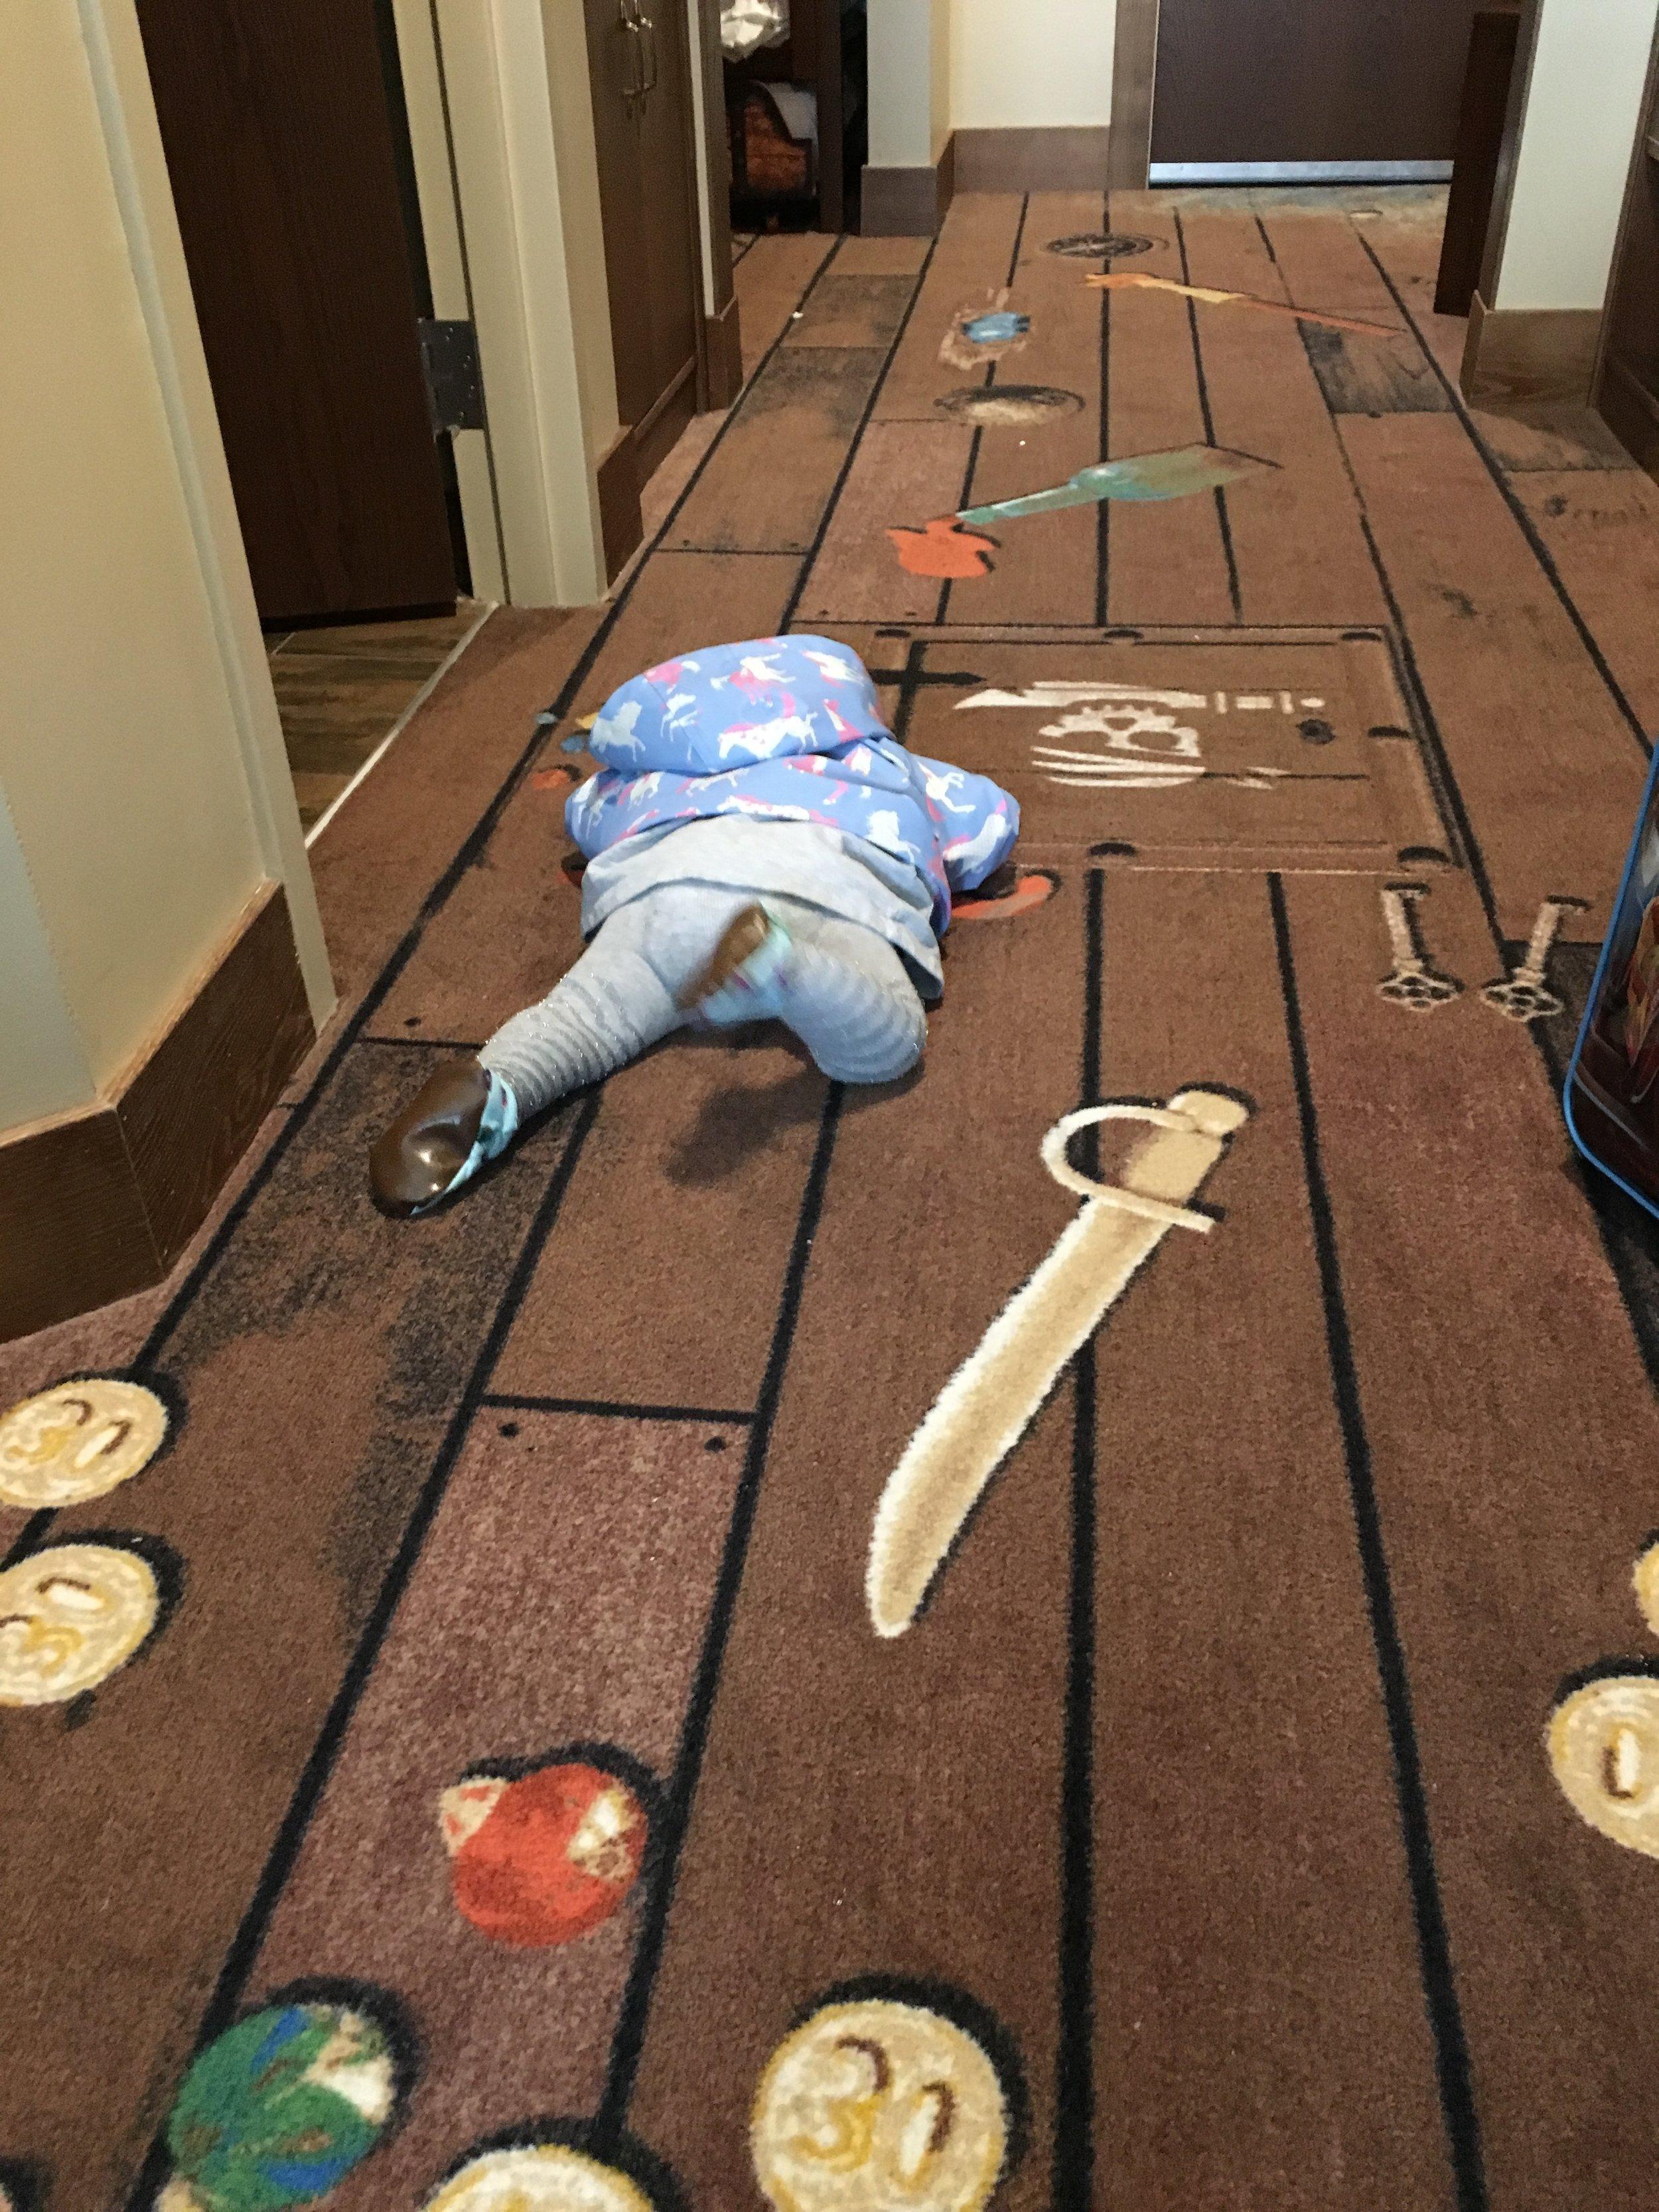 Isla exhasuted on the pirate themed floor